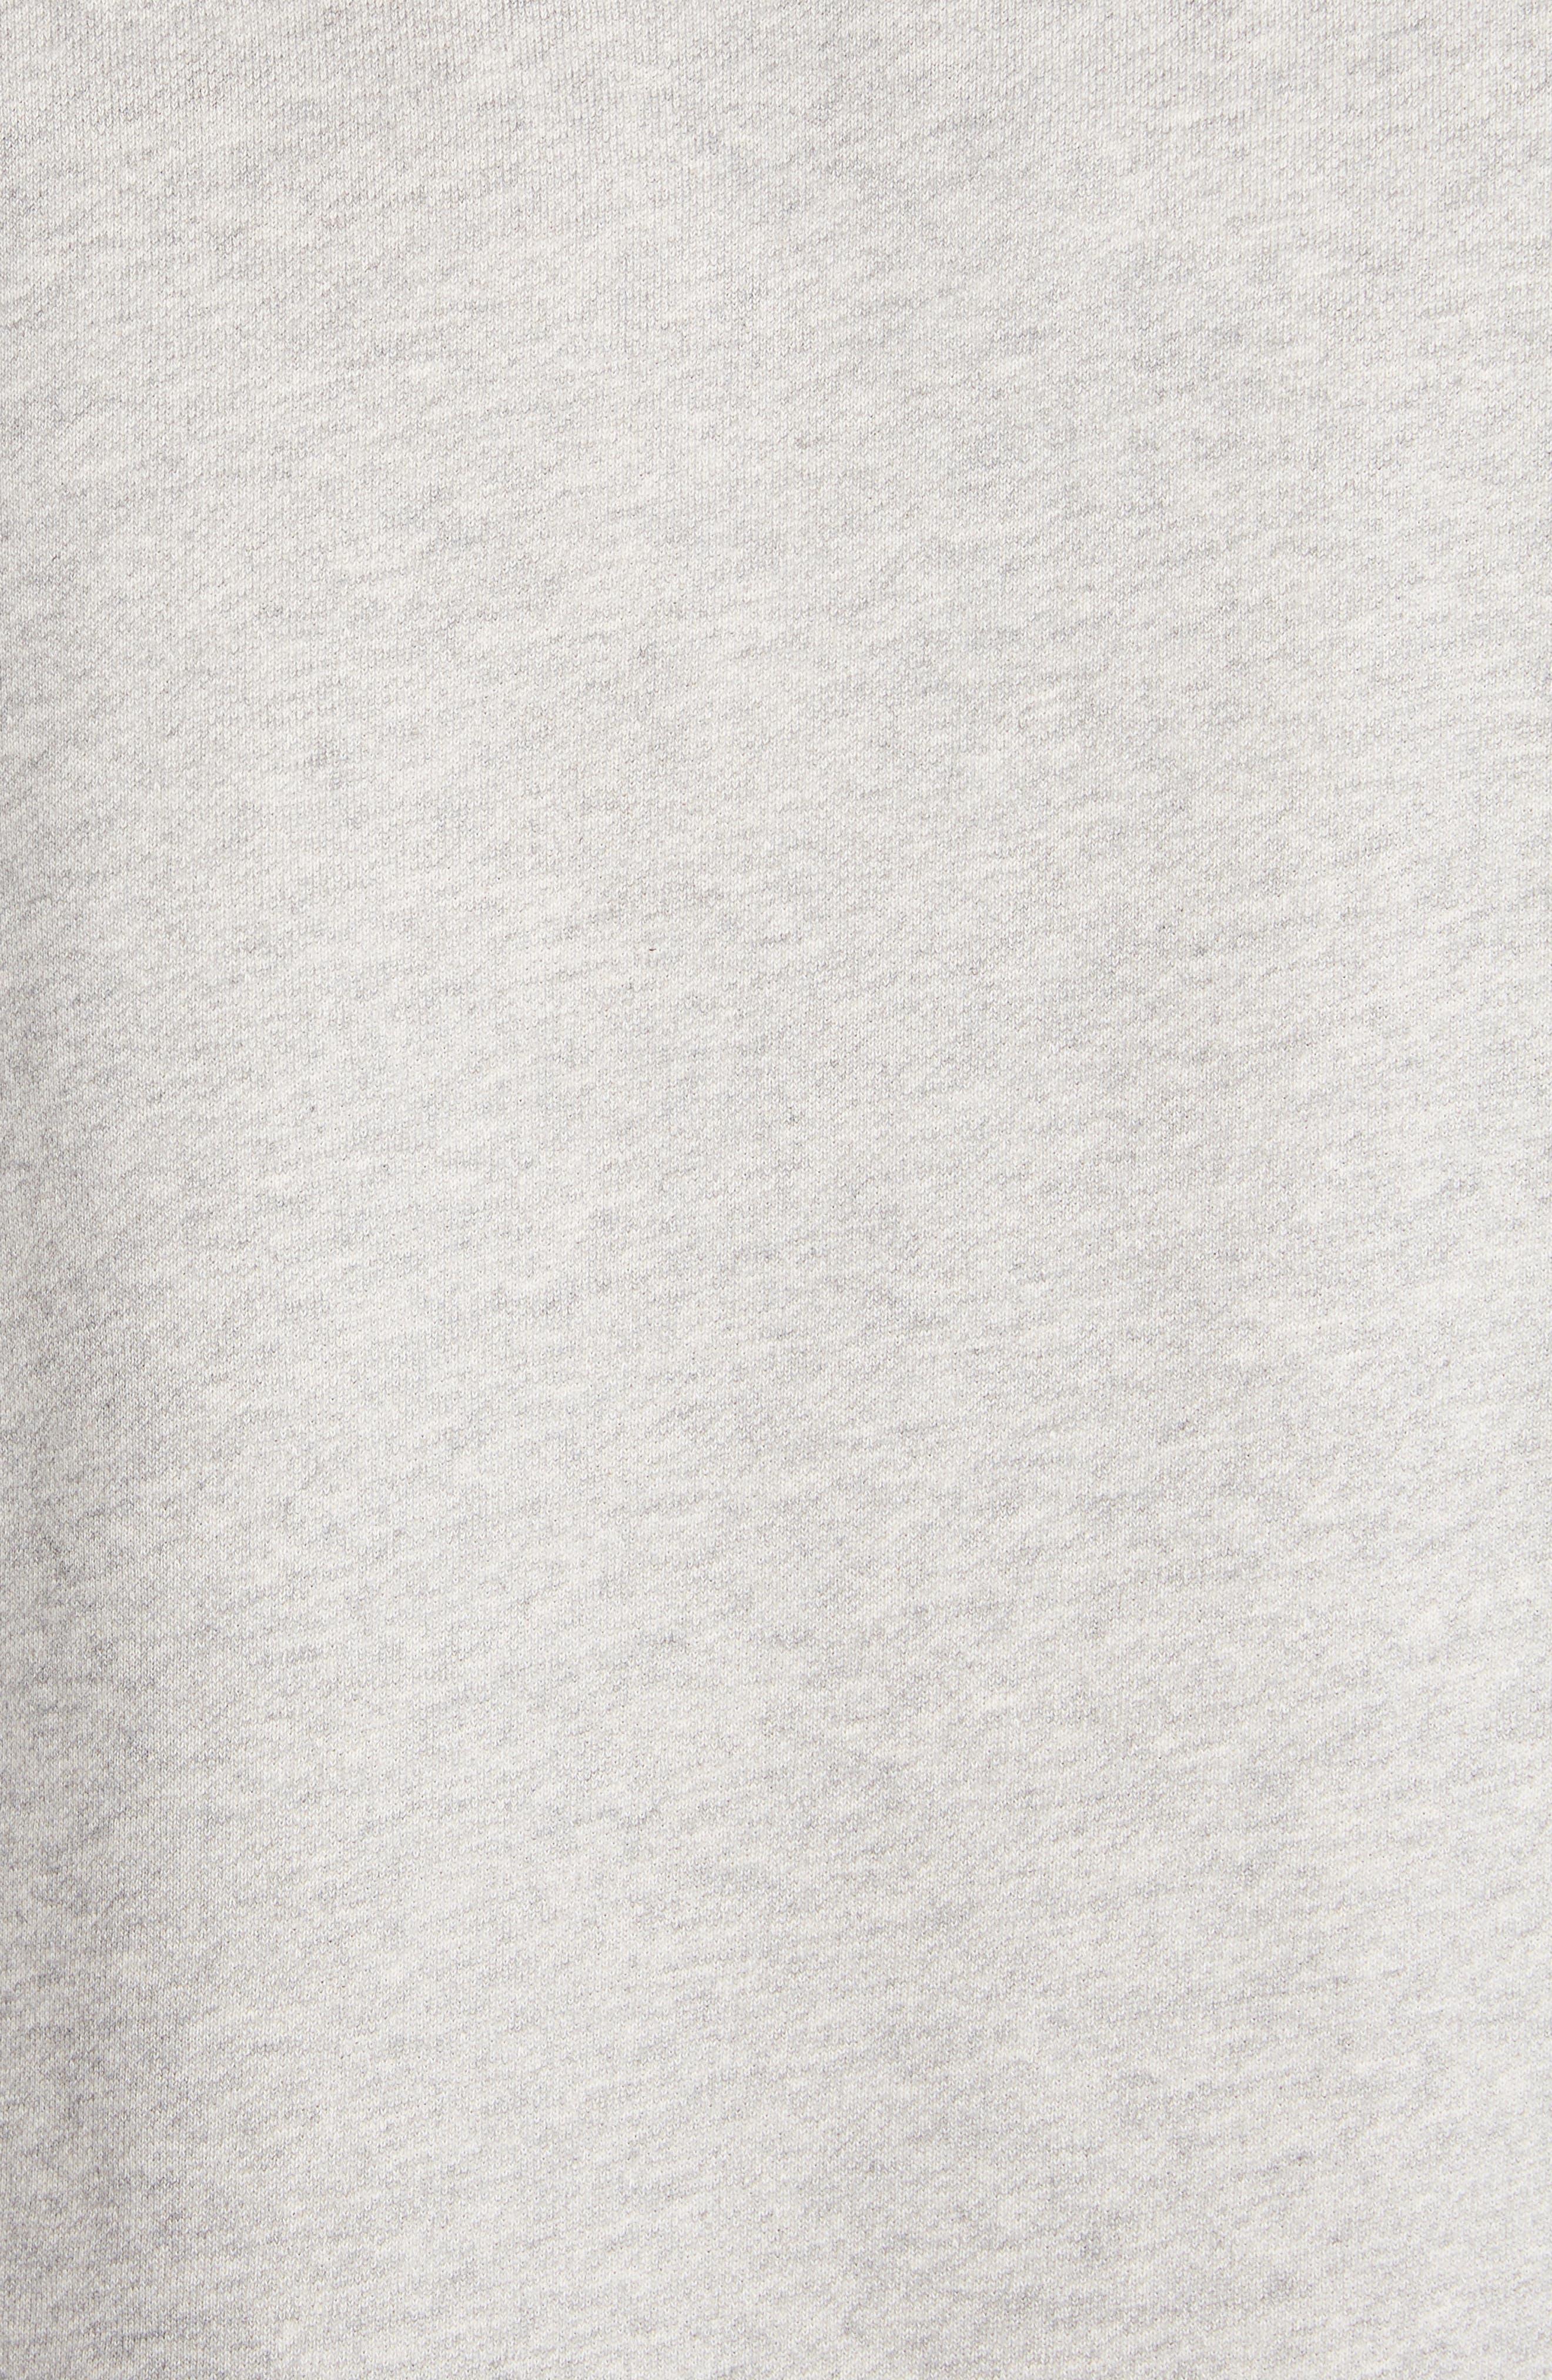 MONCLER,                             Logo Crewneck Sweatshirt,                             Alternate thumbnail 5, color,                             DARK GREY